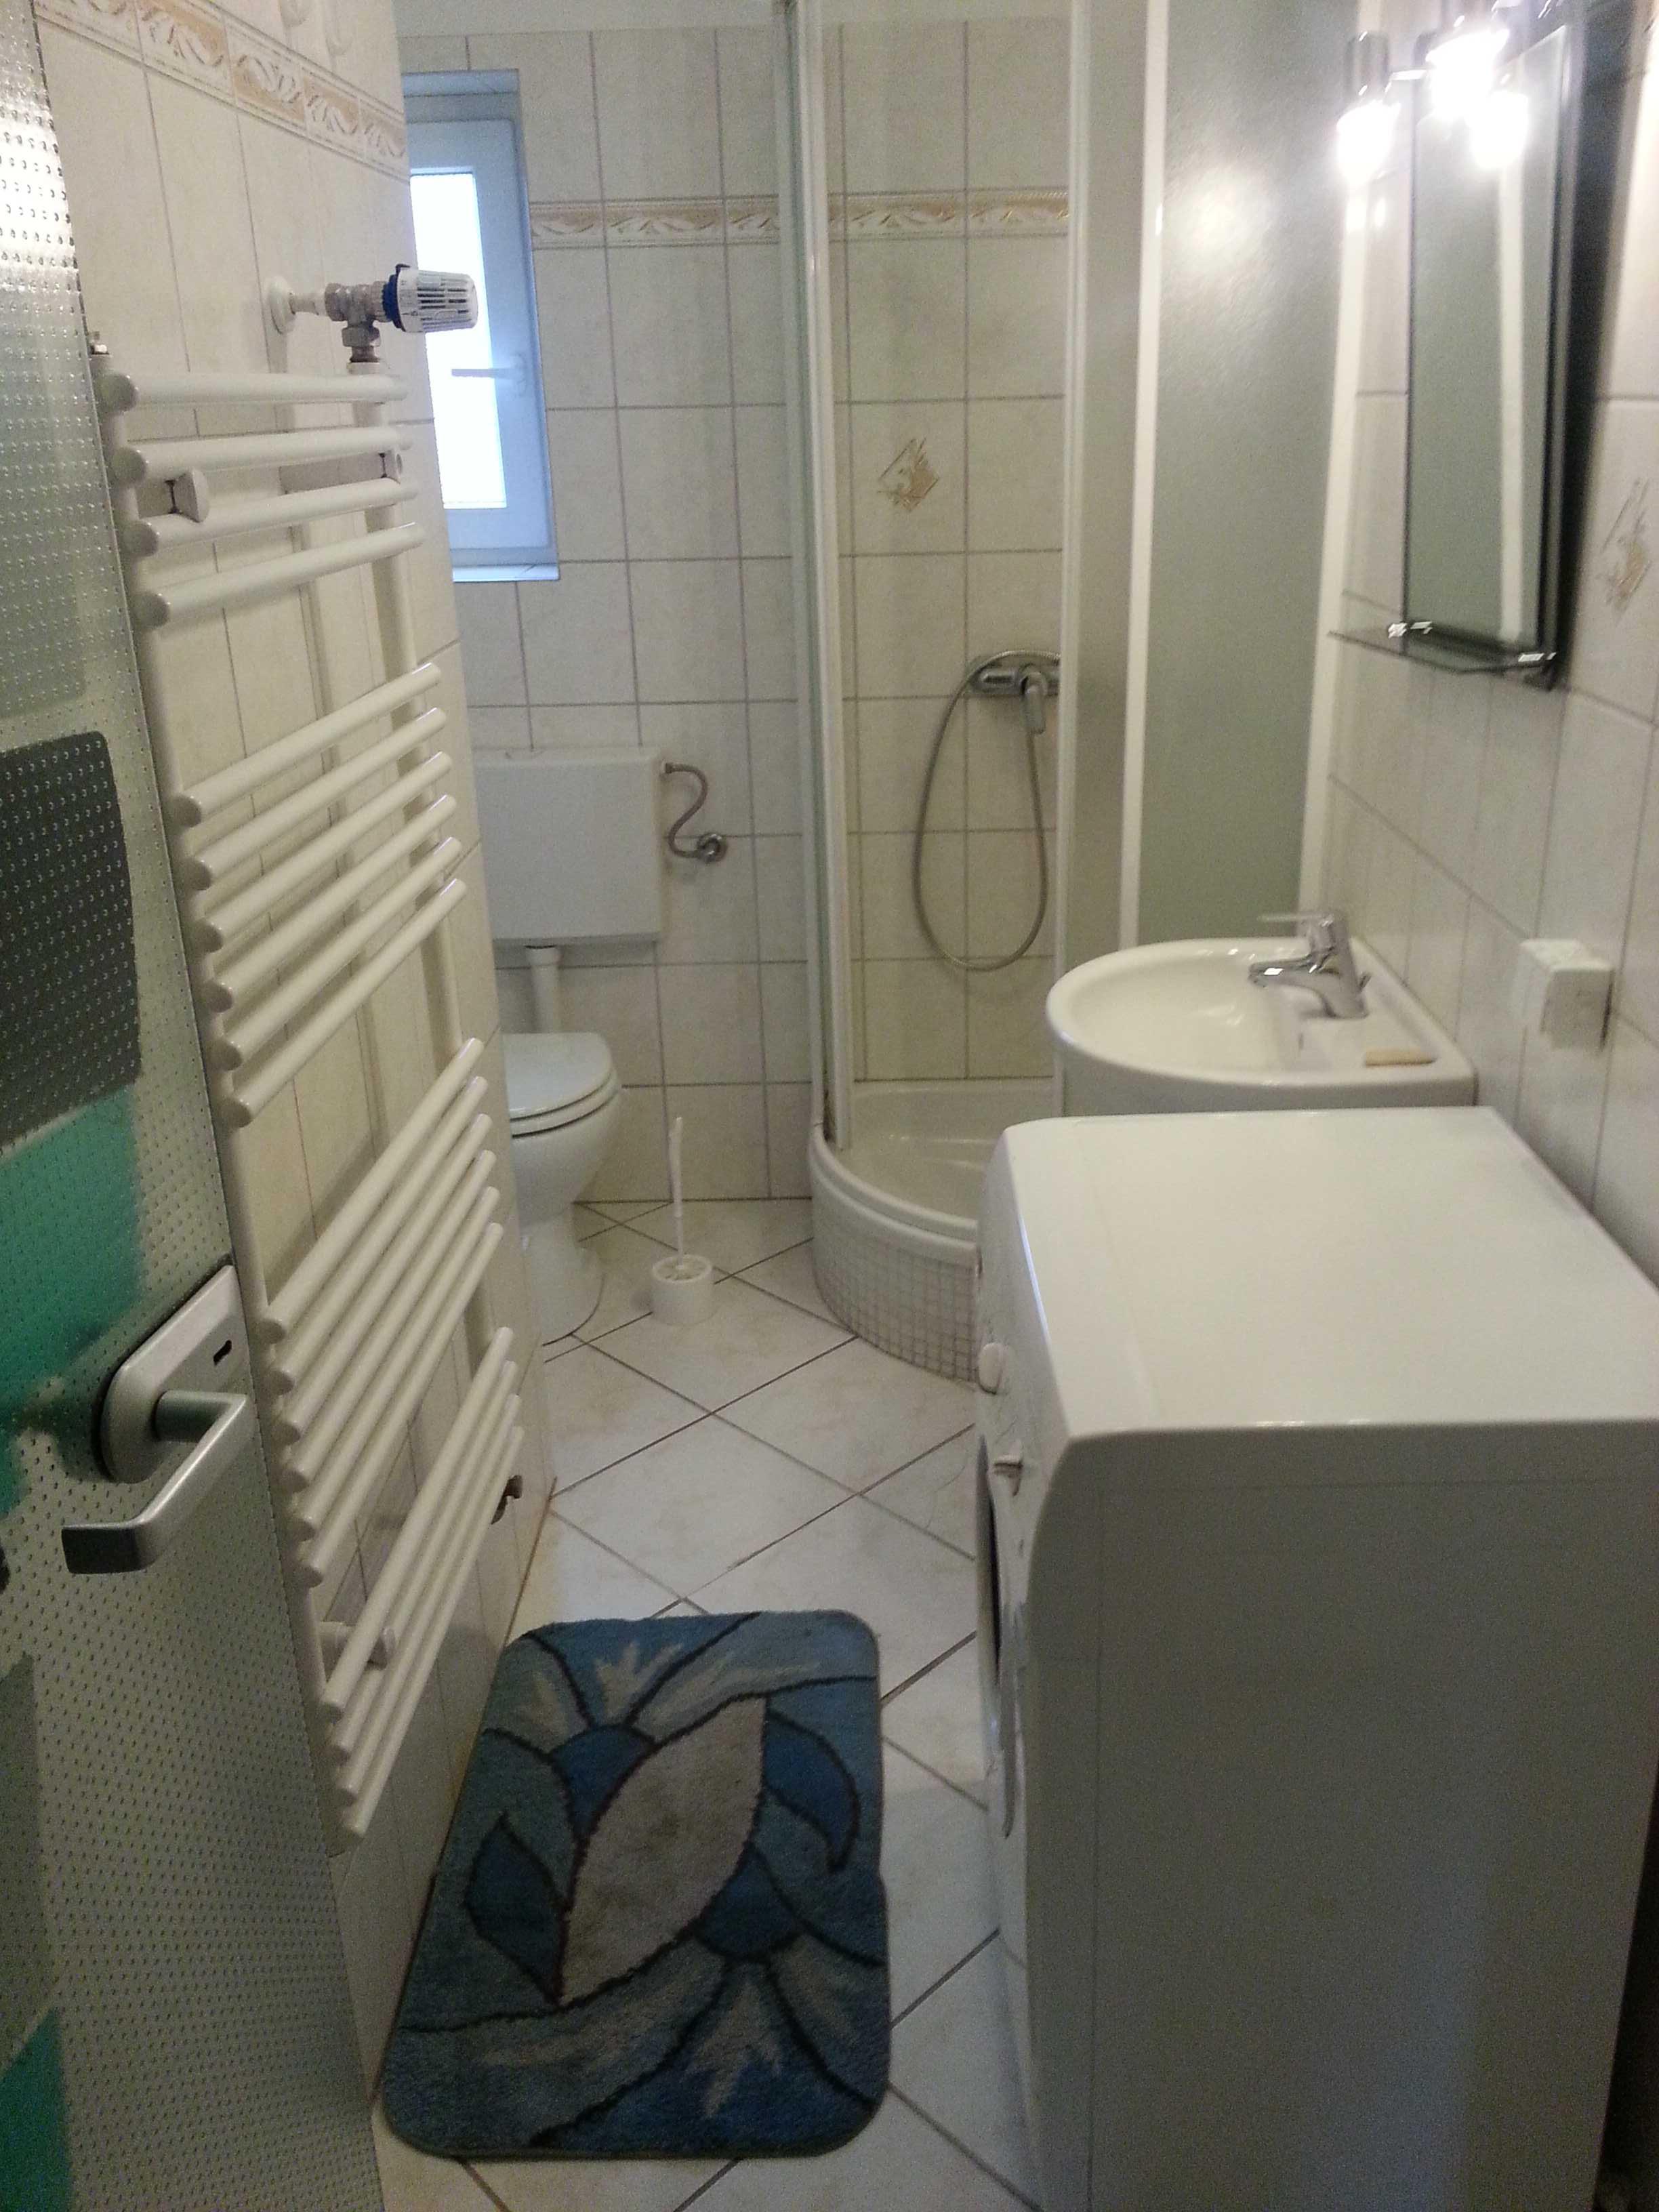 g nstige monteurzimmer wilhelmshaven monteurwohnung monteurunterkunft. Black Bedroom Furniture Sets. Home Design Ideas